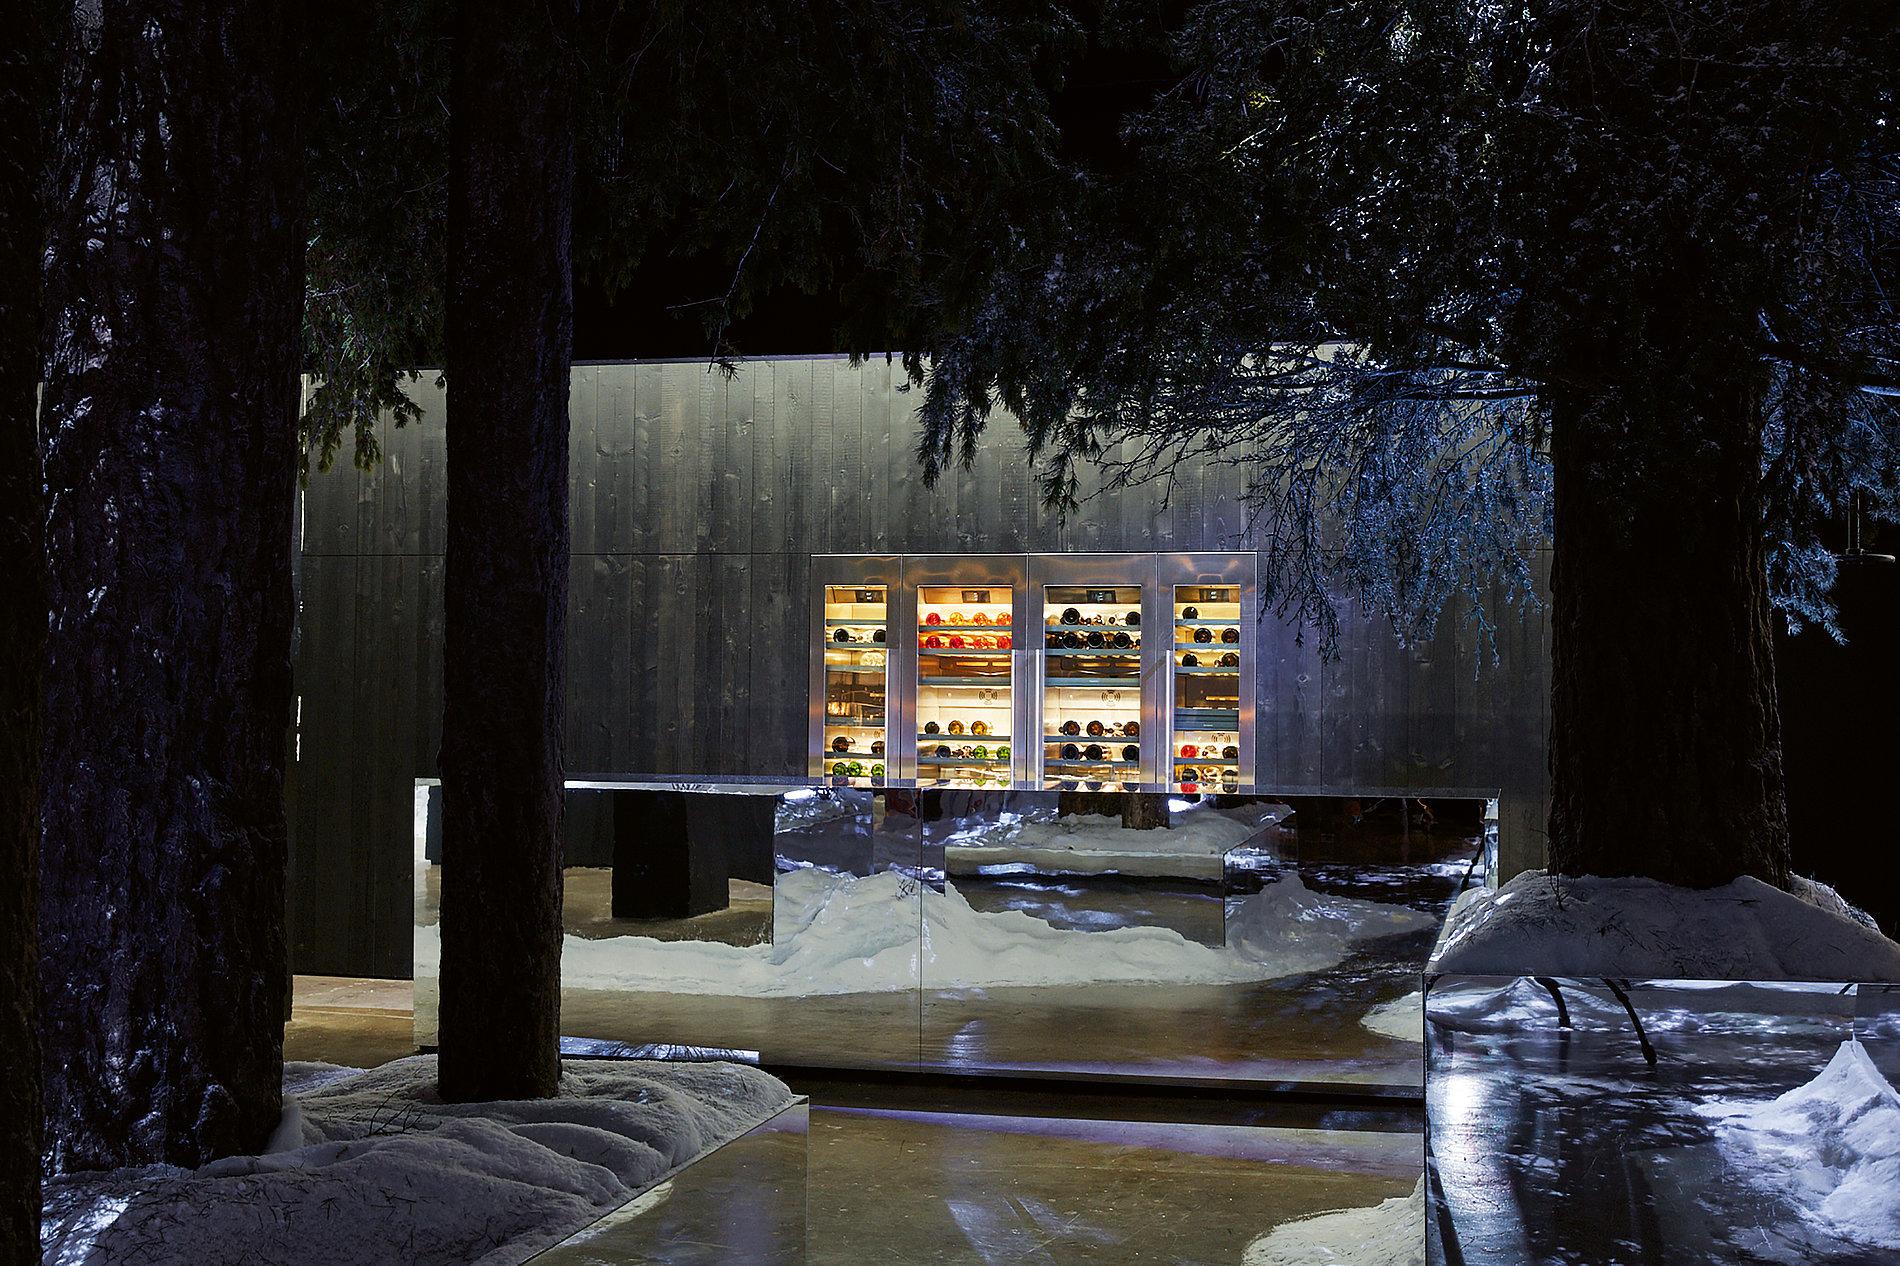 Gaggenau Restaurant 1683 LA | Red Dot Design Award